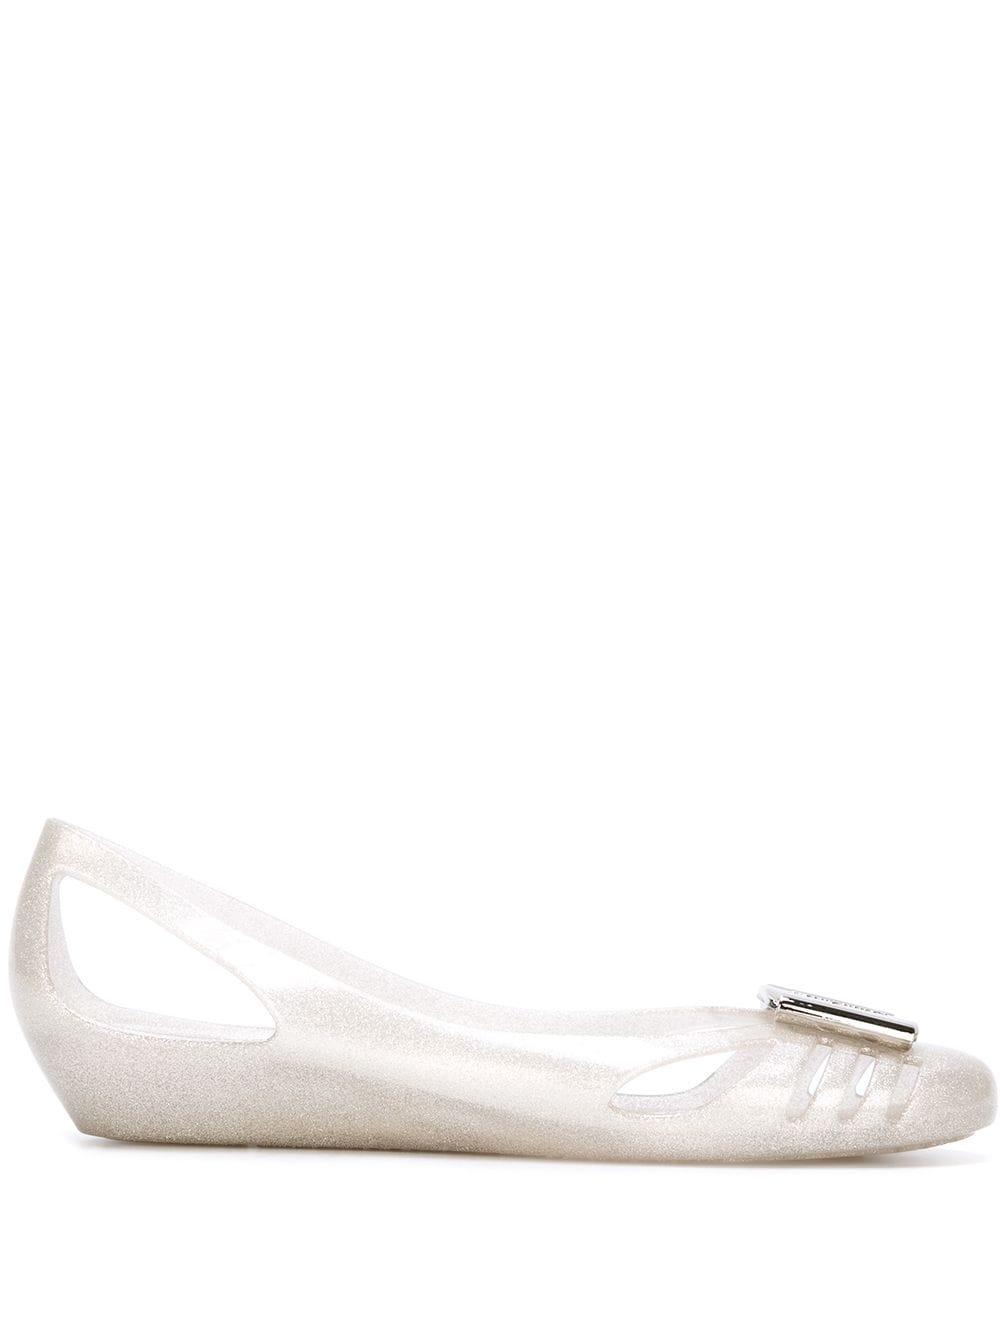 Bermuda Ballets Flats